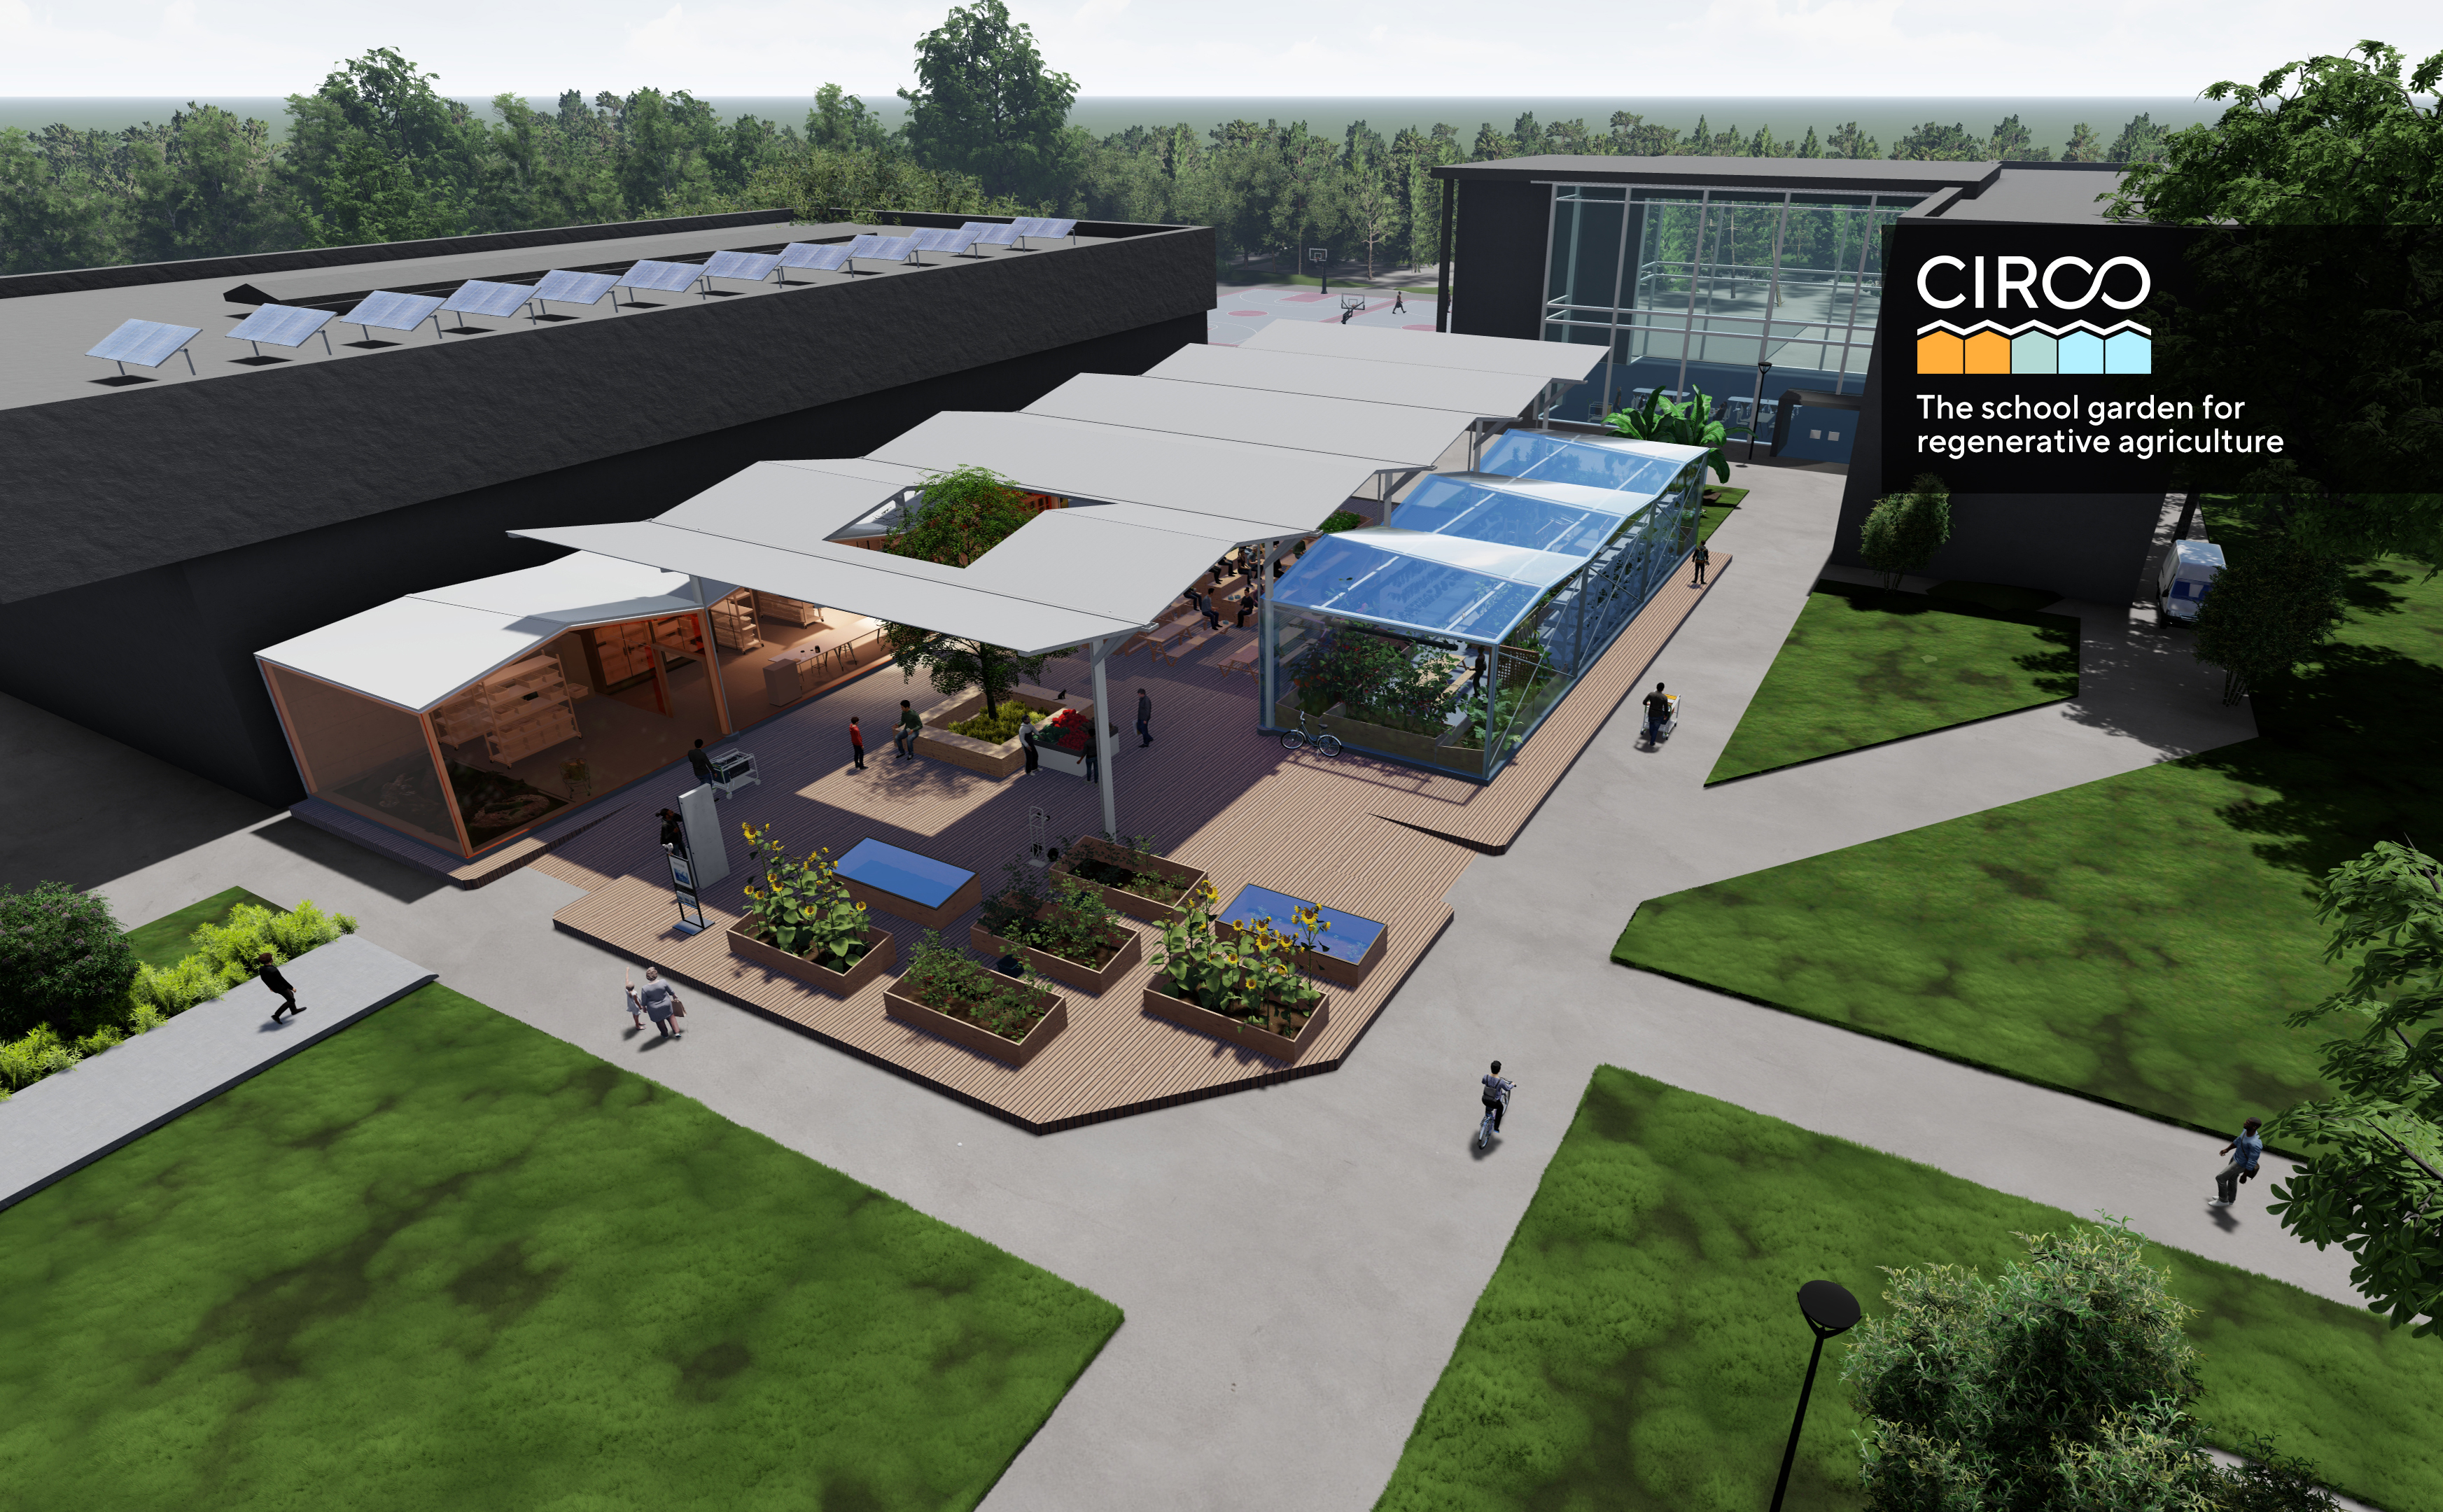 CIRCO-The school garden for regenerative agriculture